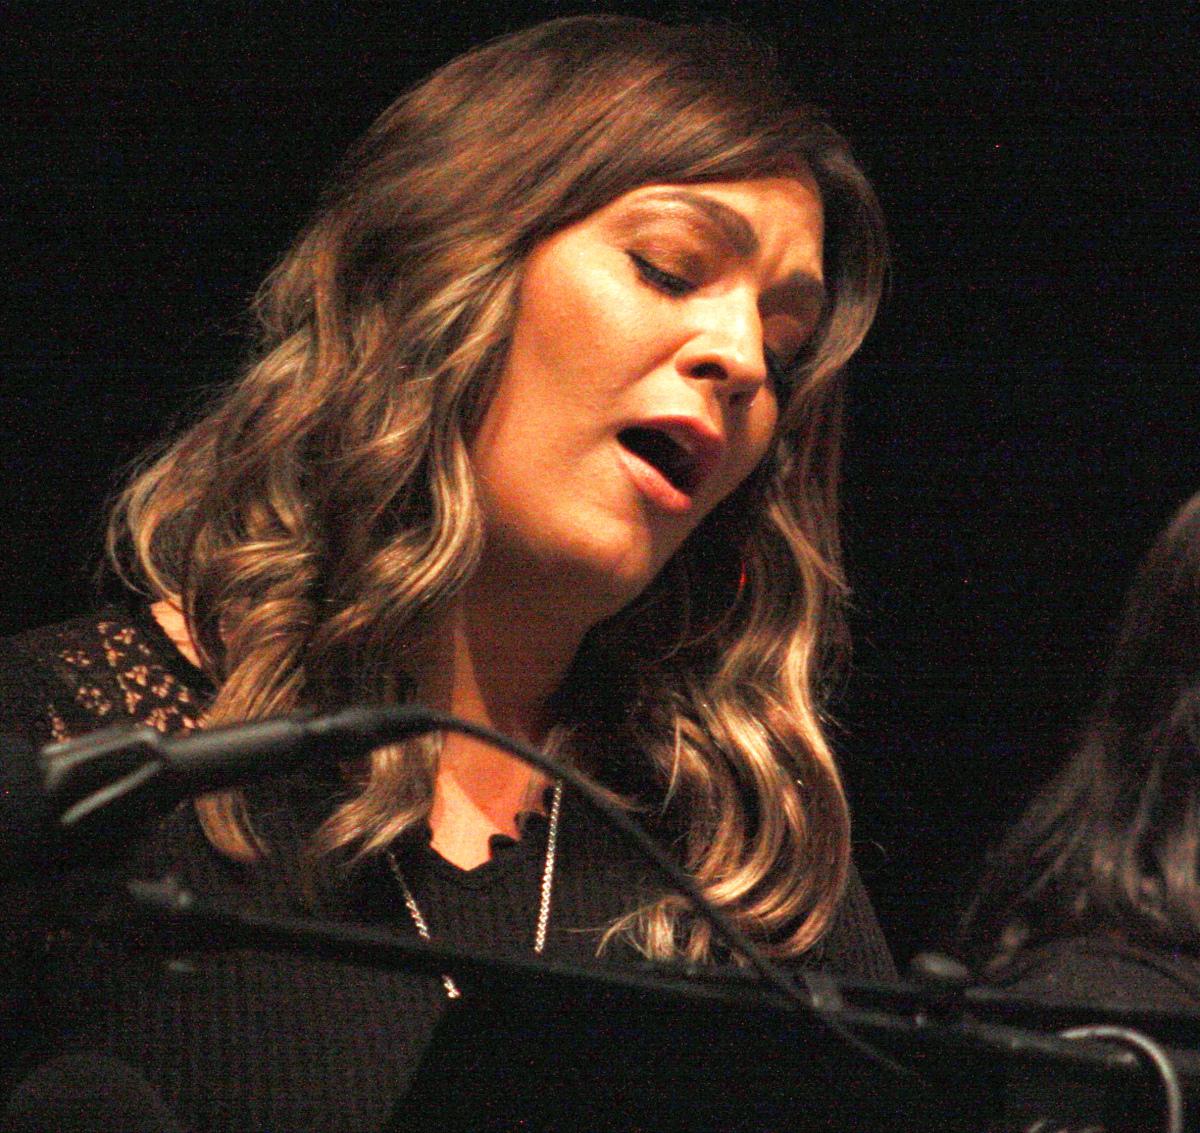 cantata singer